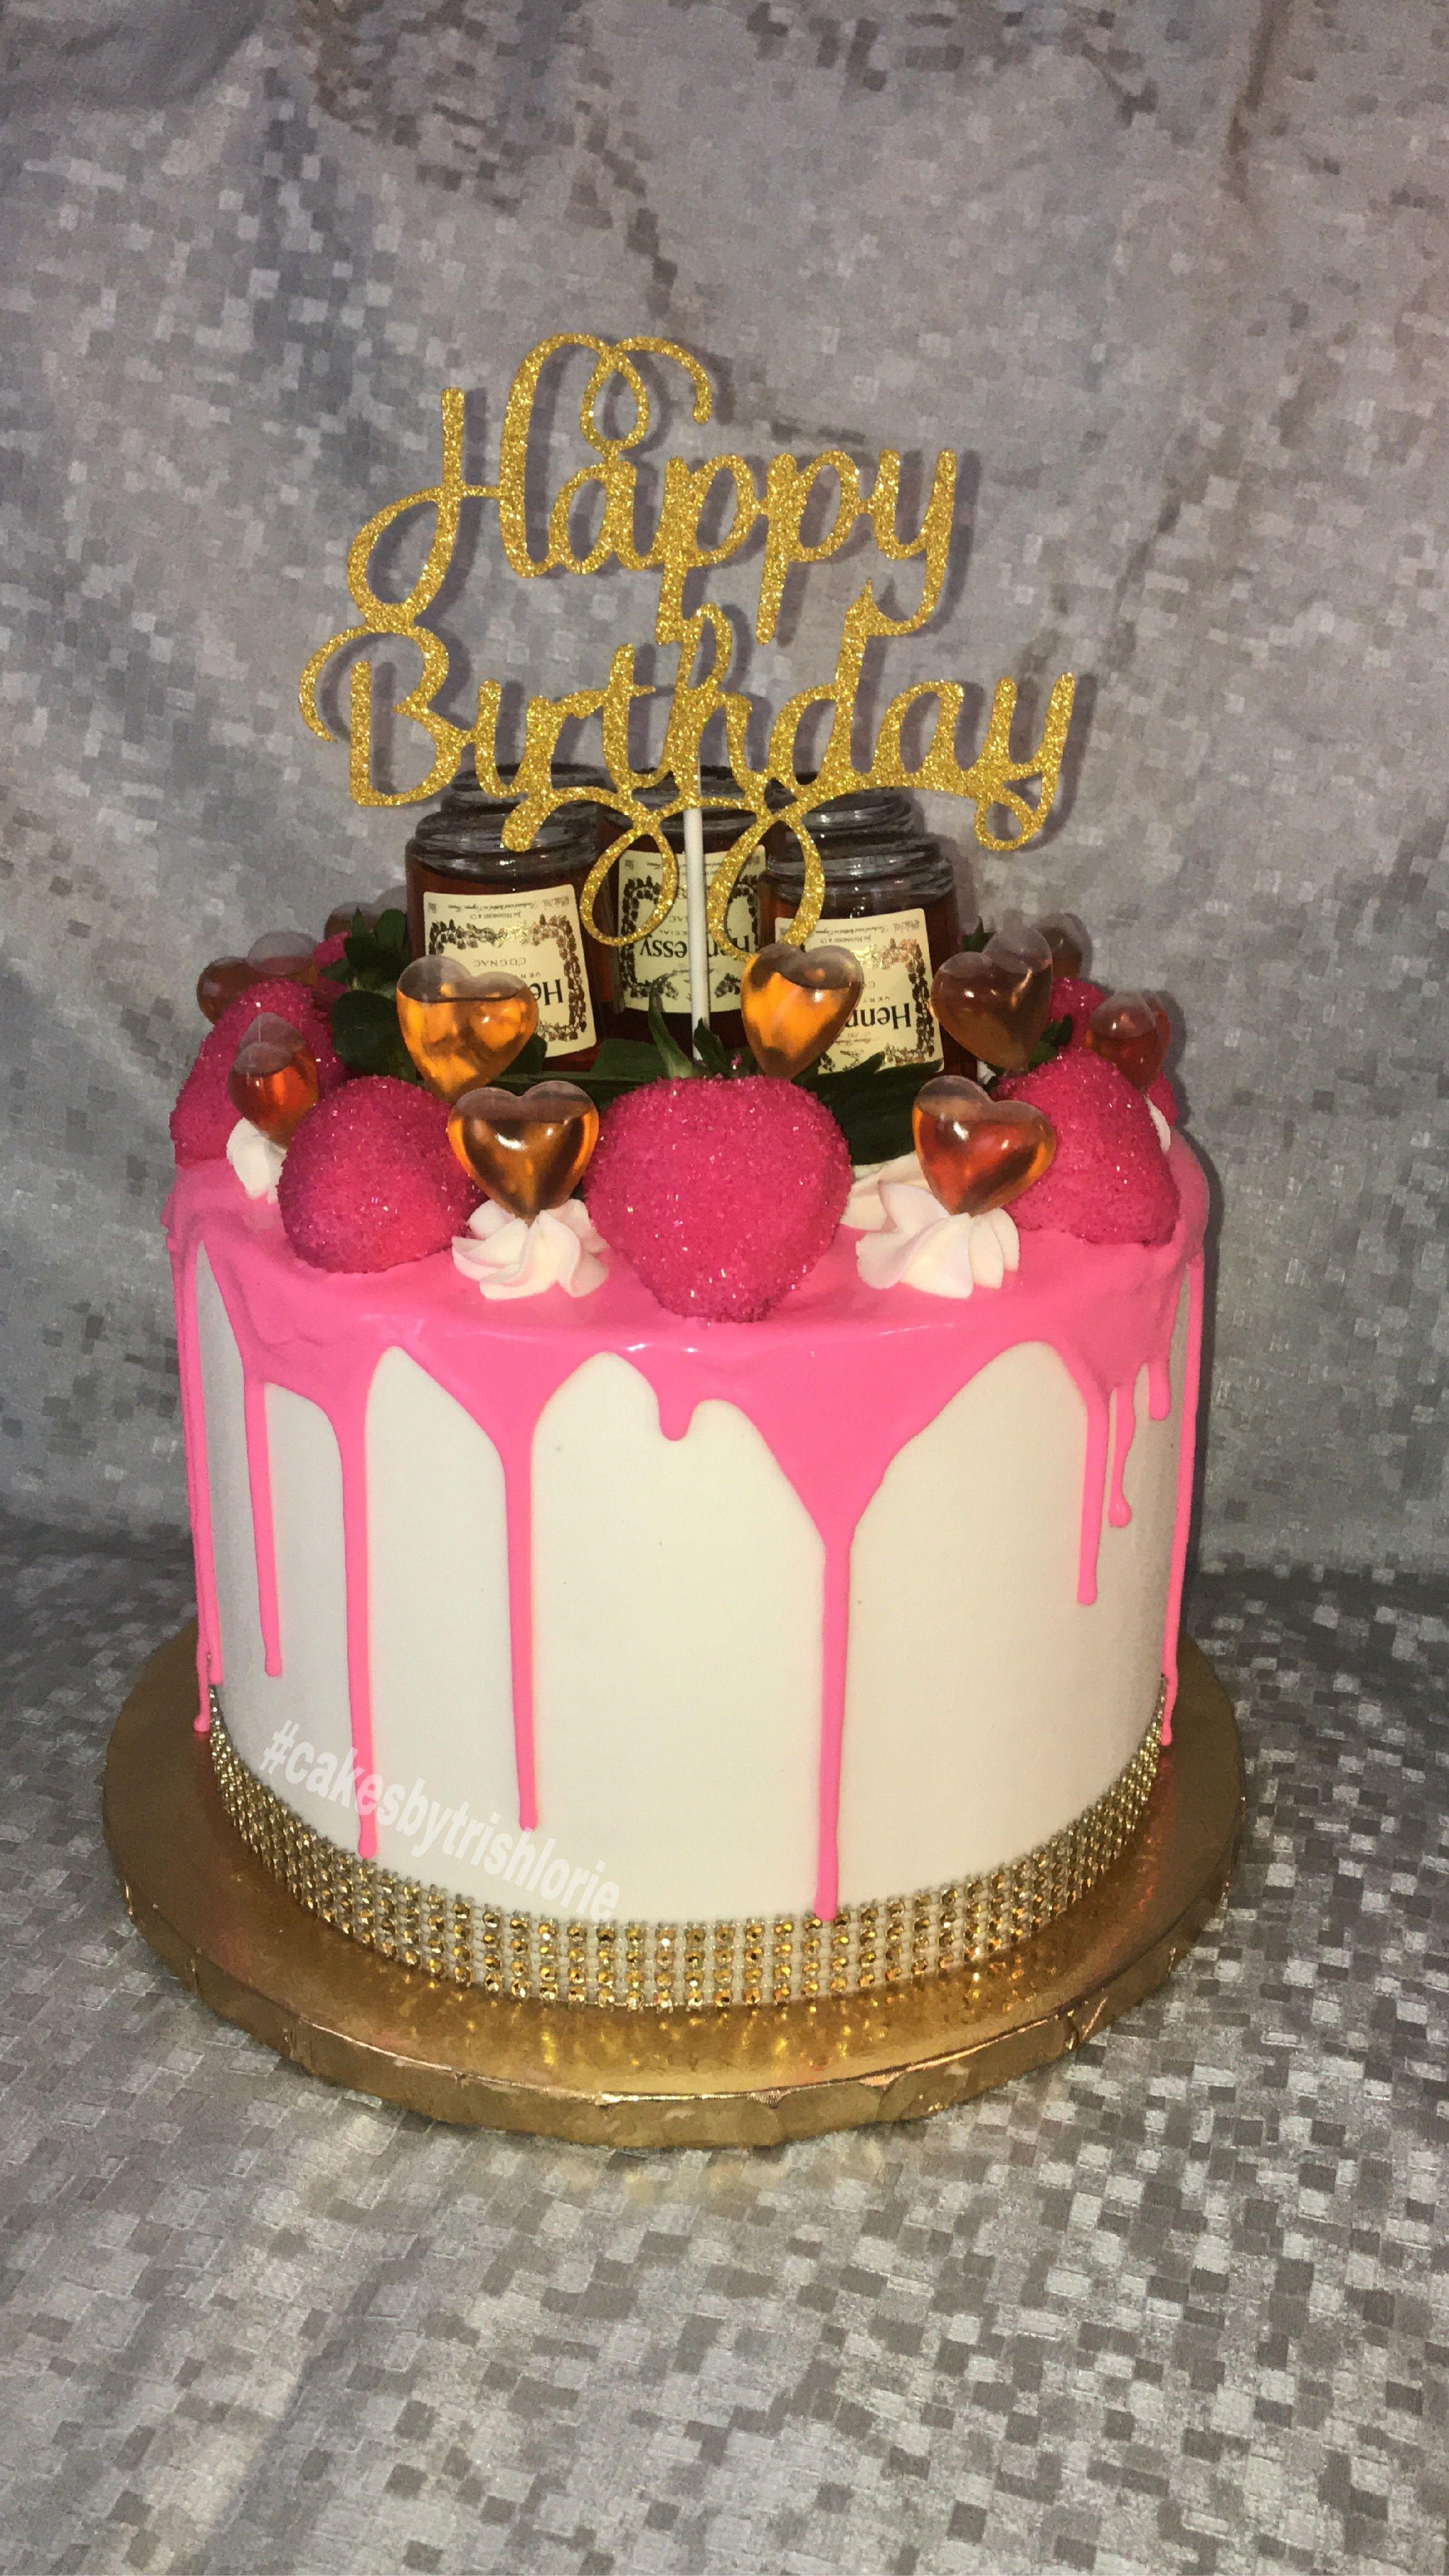 Hennessy drip cake 21st birthday cakes alcohol cake